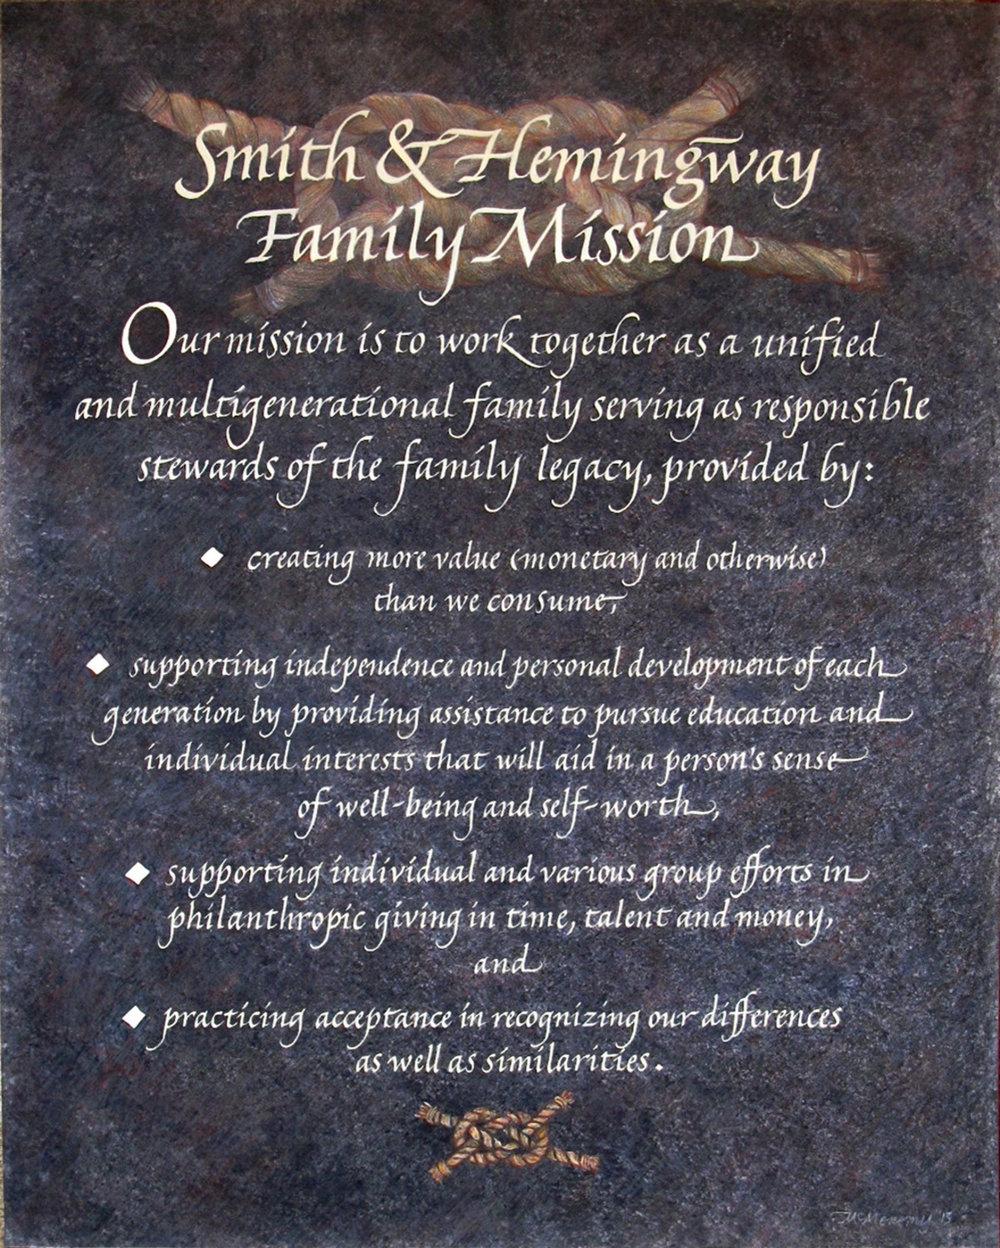 Smith & Hemingway Mission